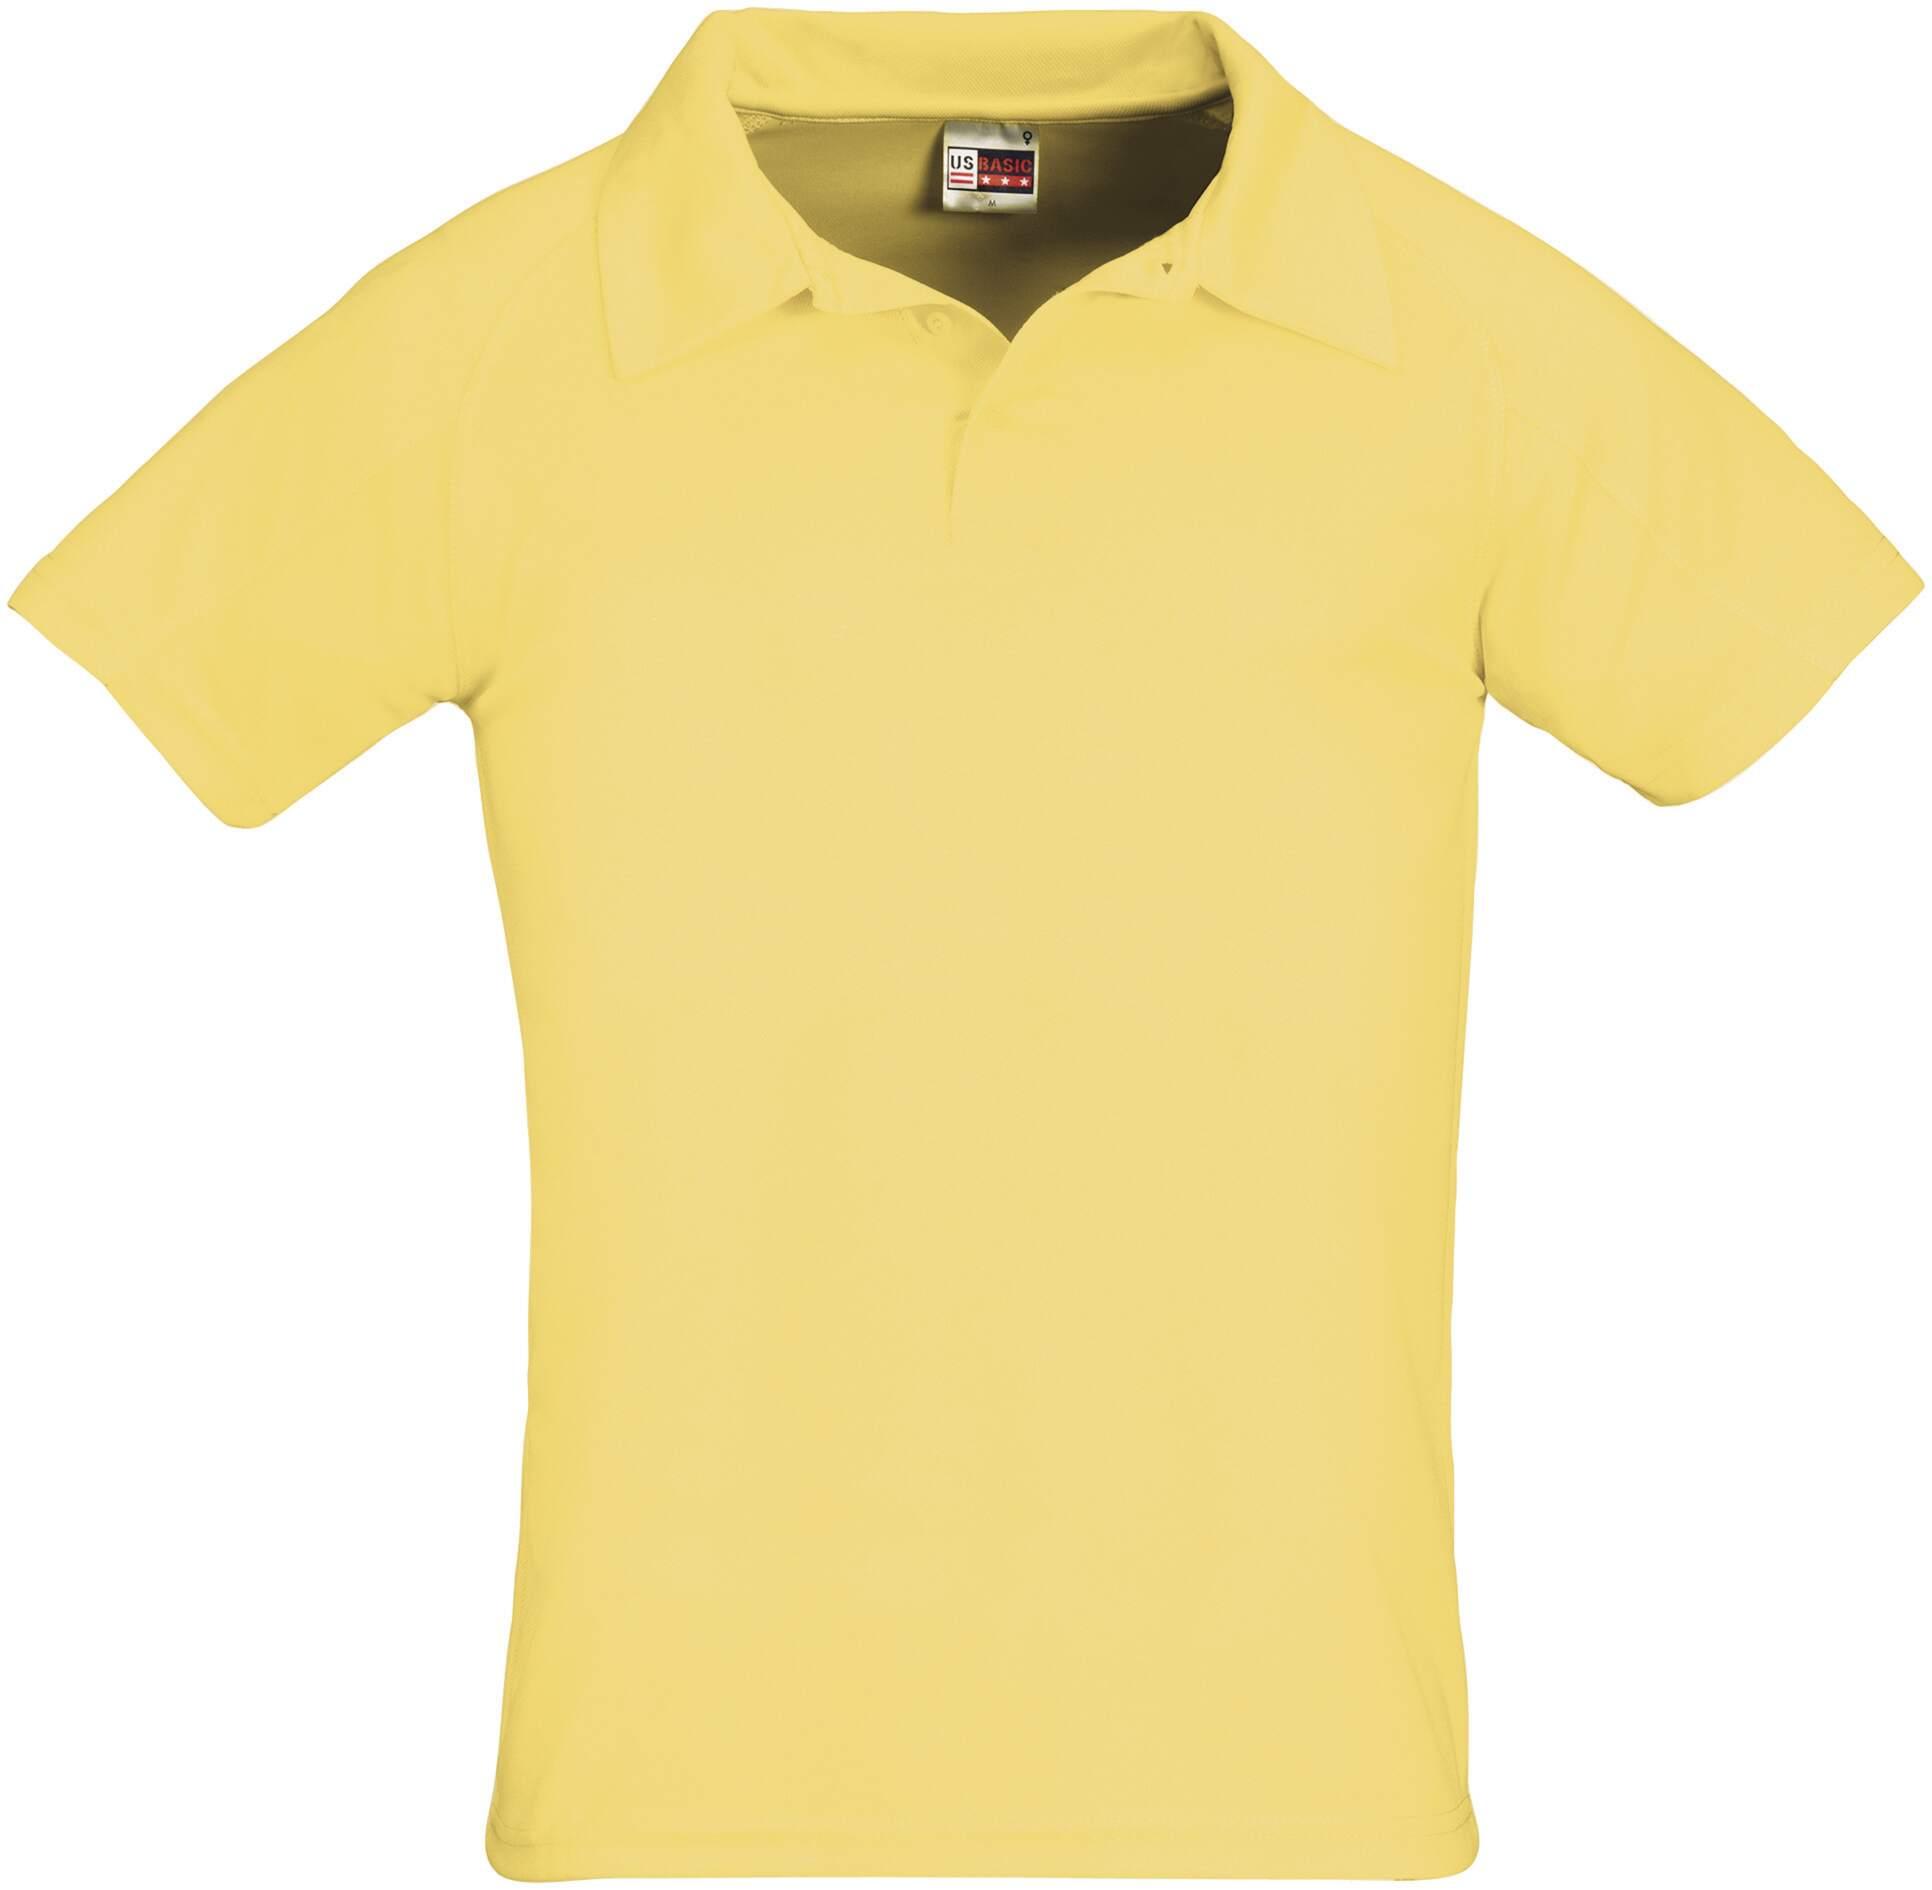 Koszulki Polo US 31098 Cool Fit - 31098_żółty_US - Kolor: Żółty